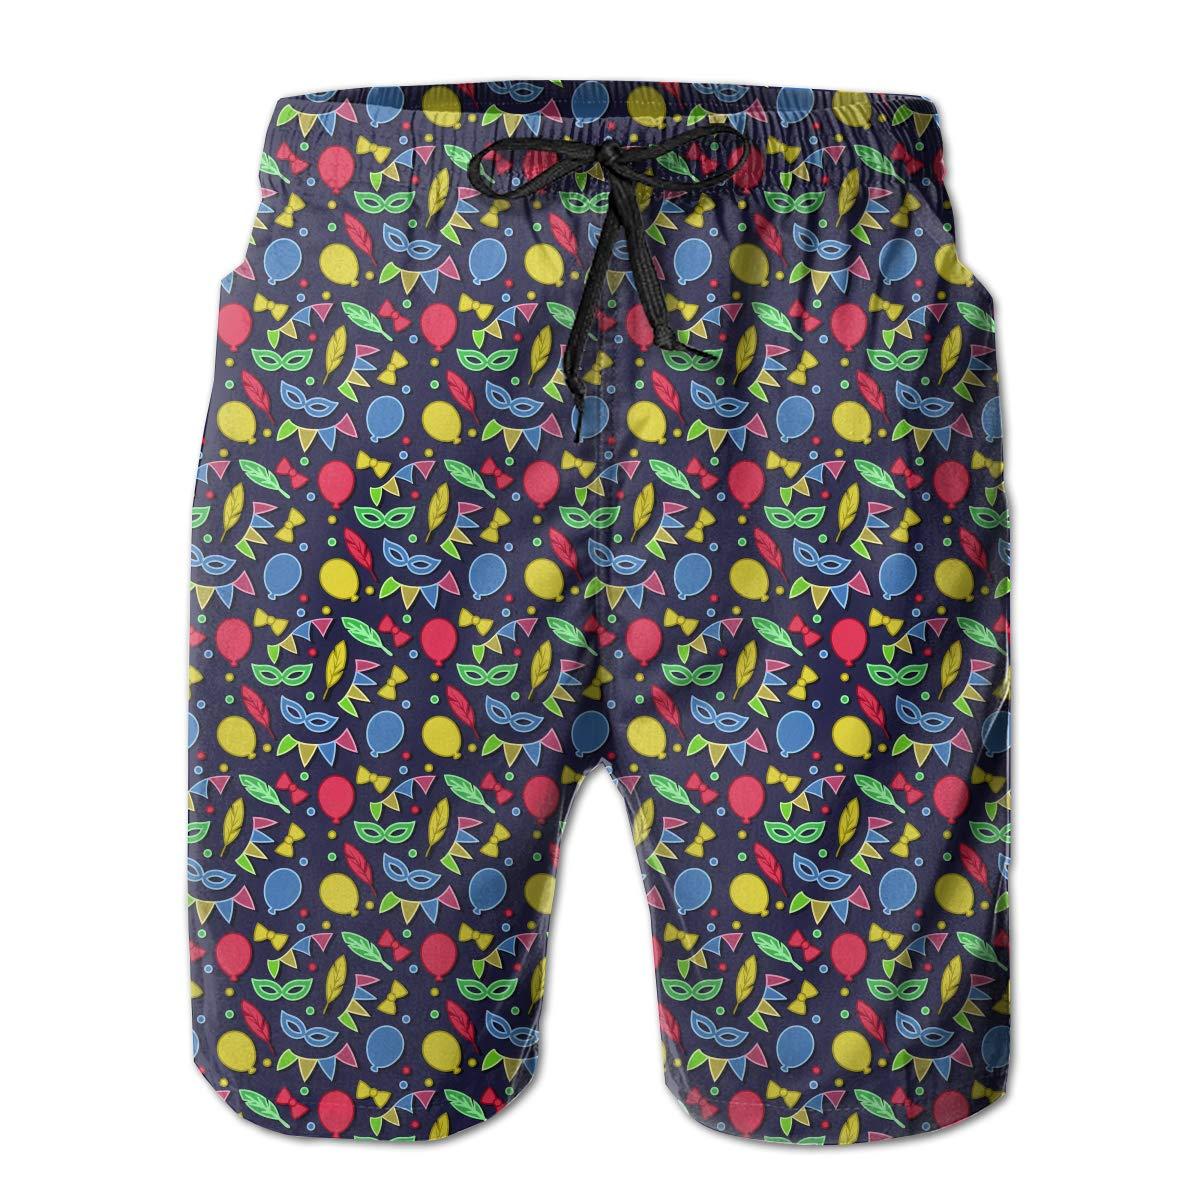 Fancy Illusion Mardi Gras Carnival Masks Casual Boys Men S Shorts Swim Trunks Board Shorts for Men